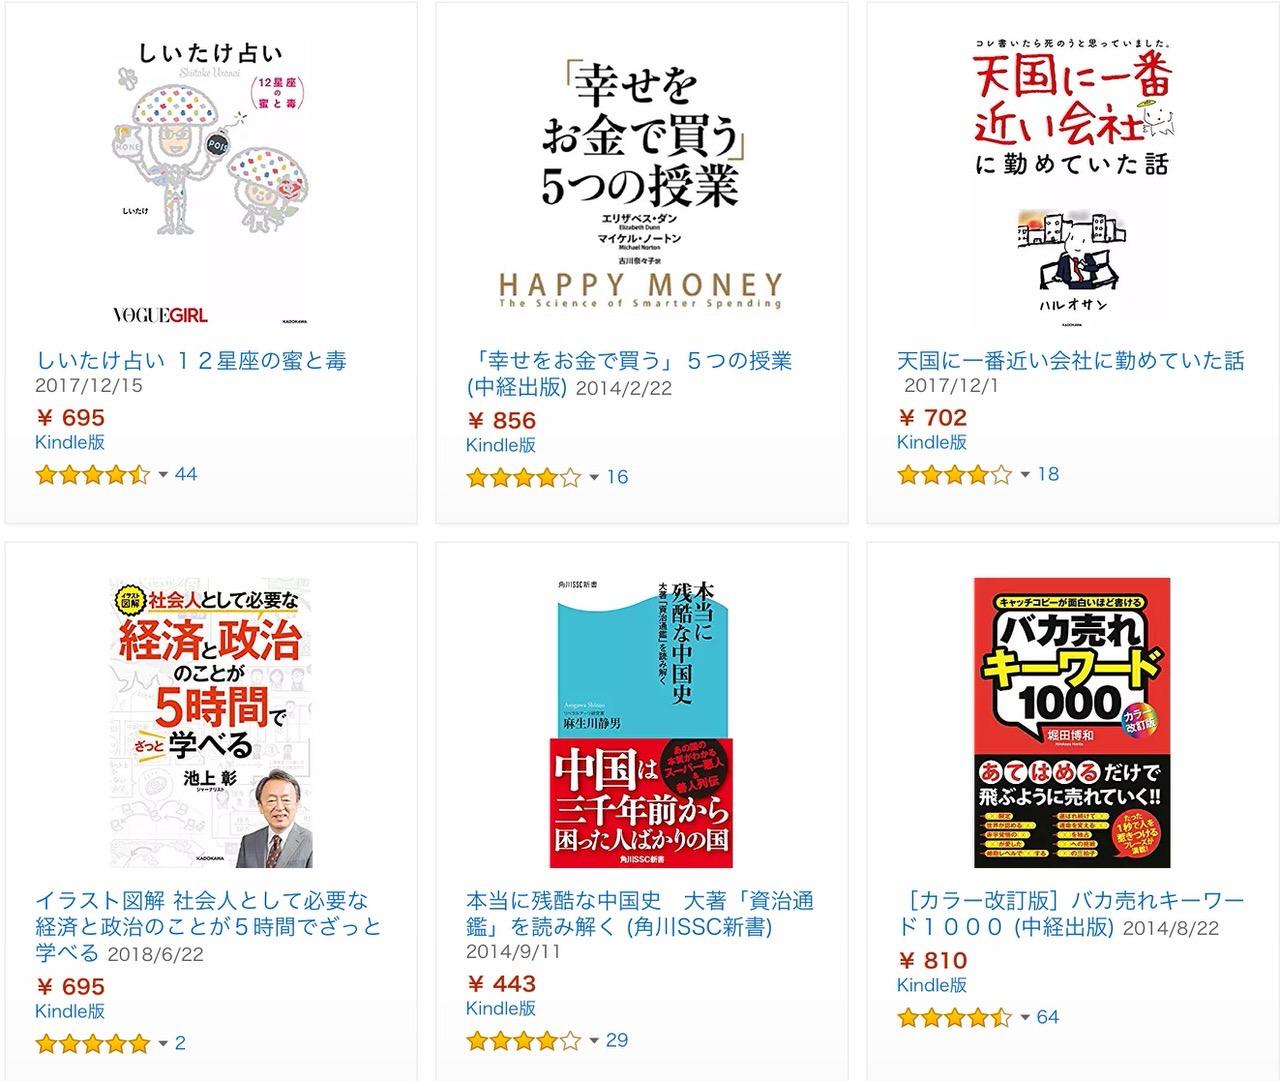 【Kindleセール】約800冊が対象!最大70%OFF「KADOKAWA 秋の雑学&教養本フェア」開催中(11/29まで)